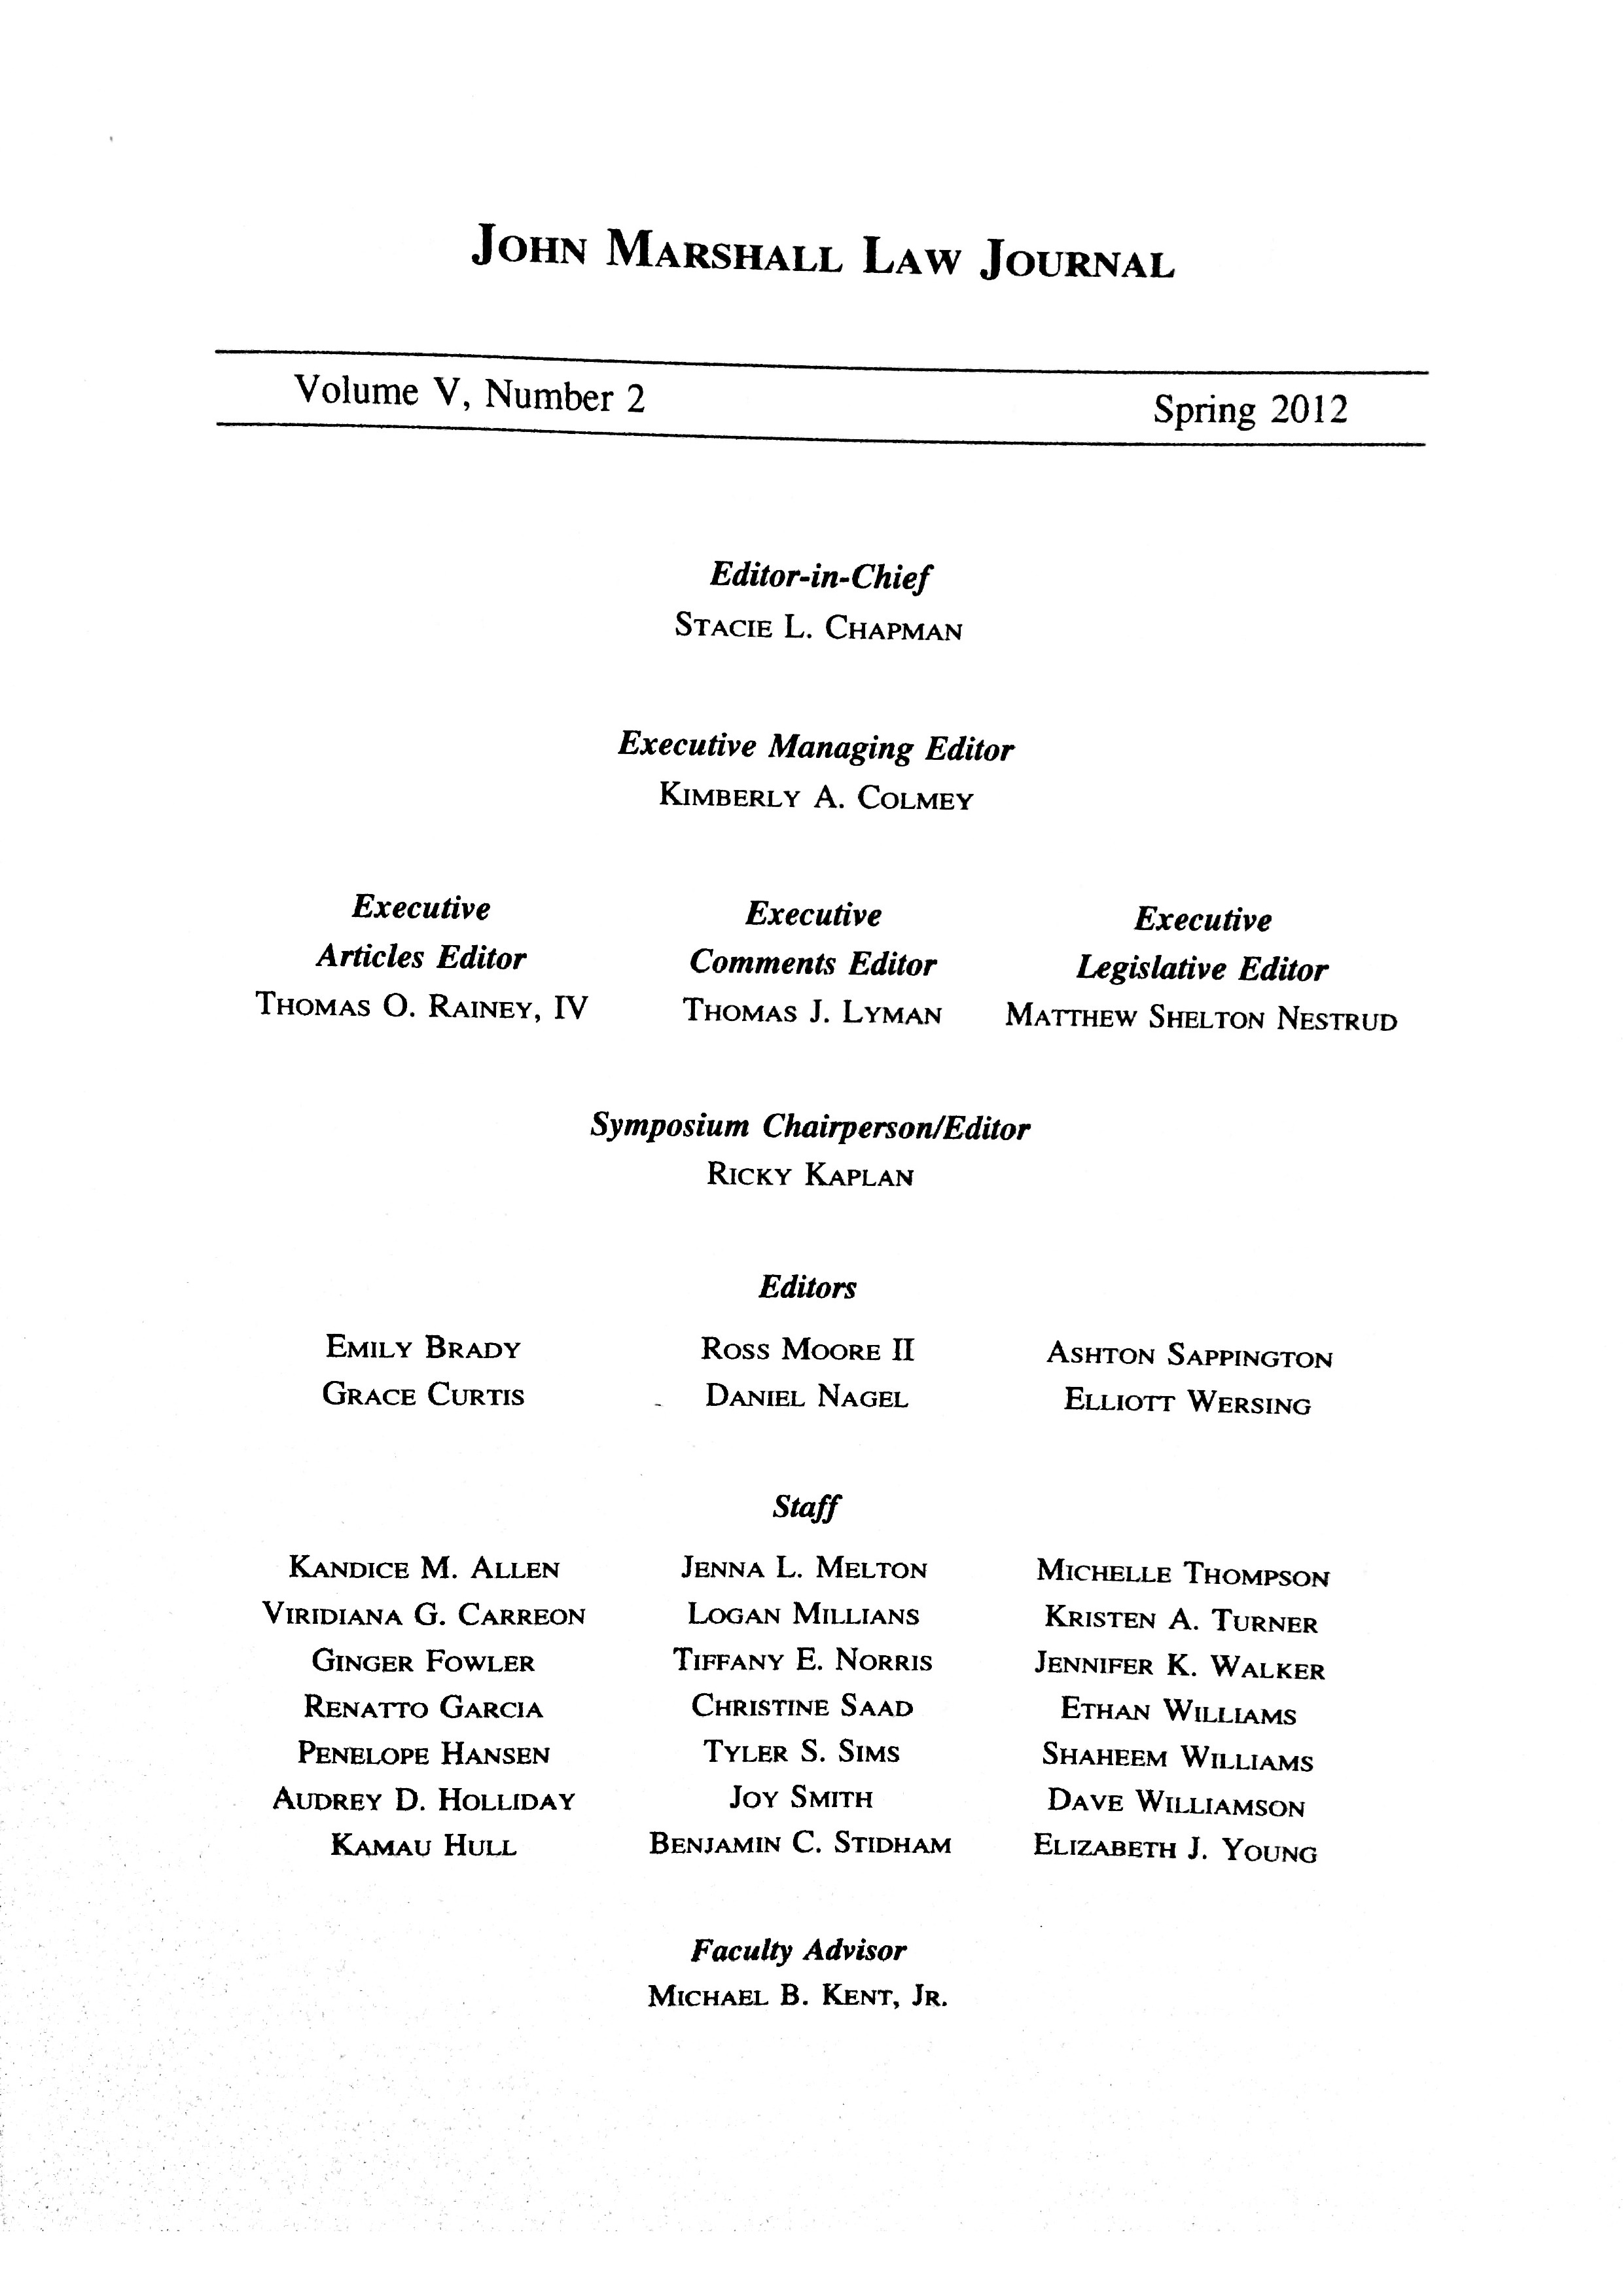 5-2_JMLJ_Masthead-page-0